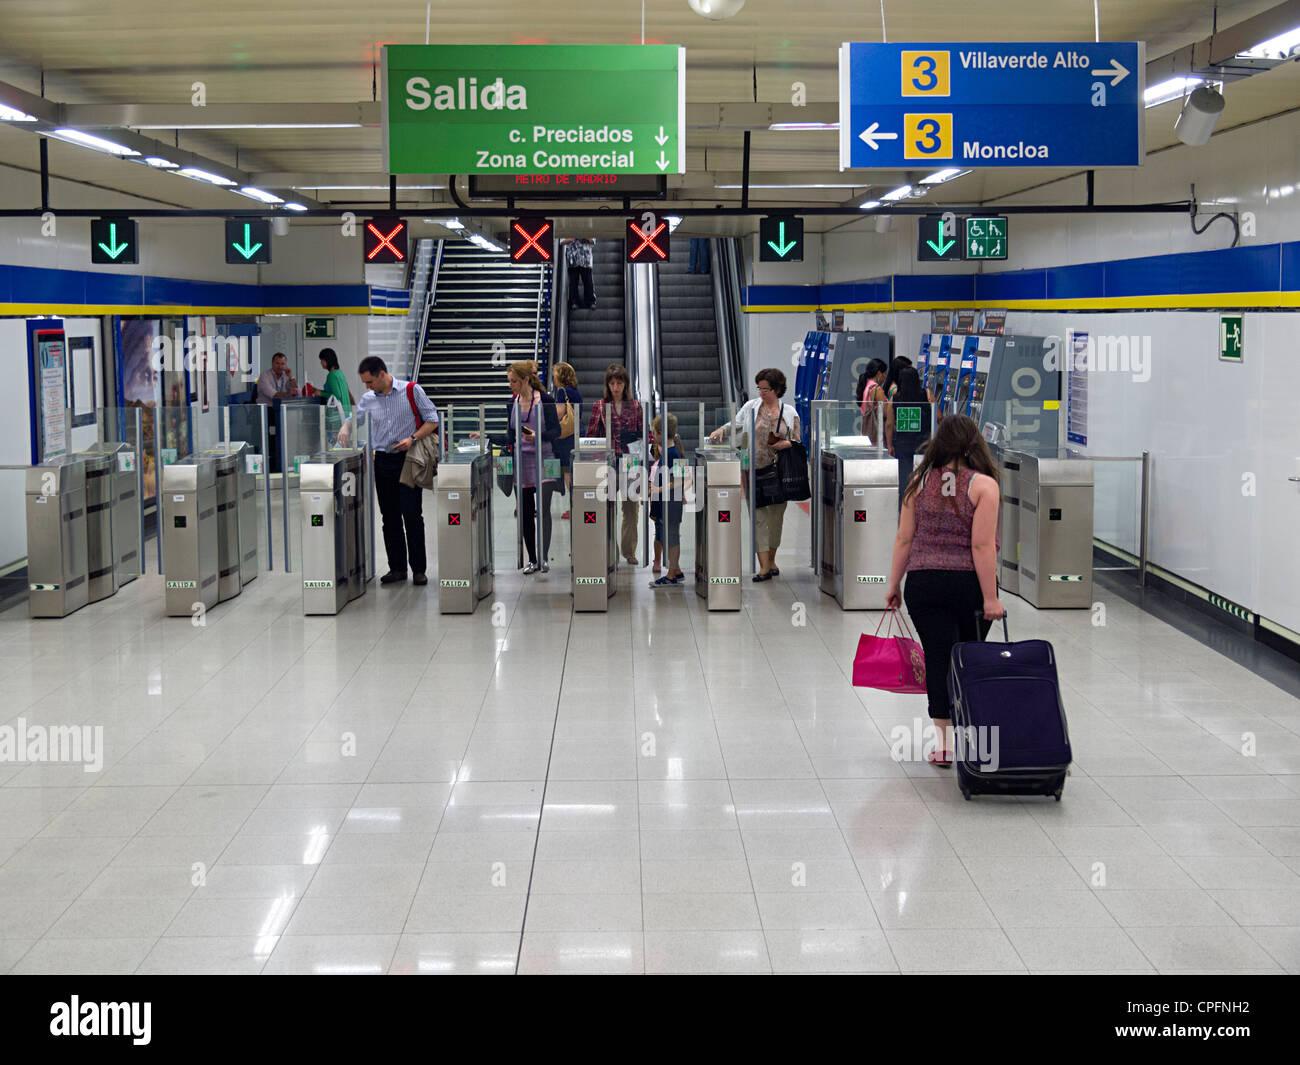 Ticket validation machines at a Madrid metro station - Stock Image